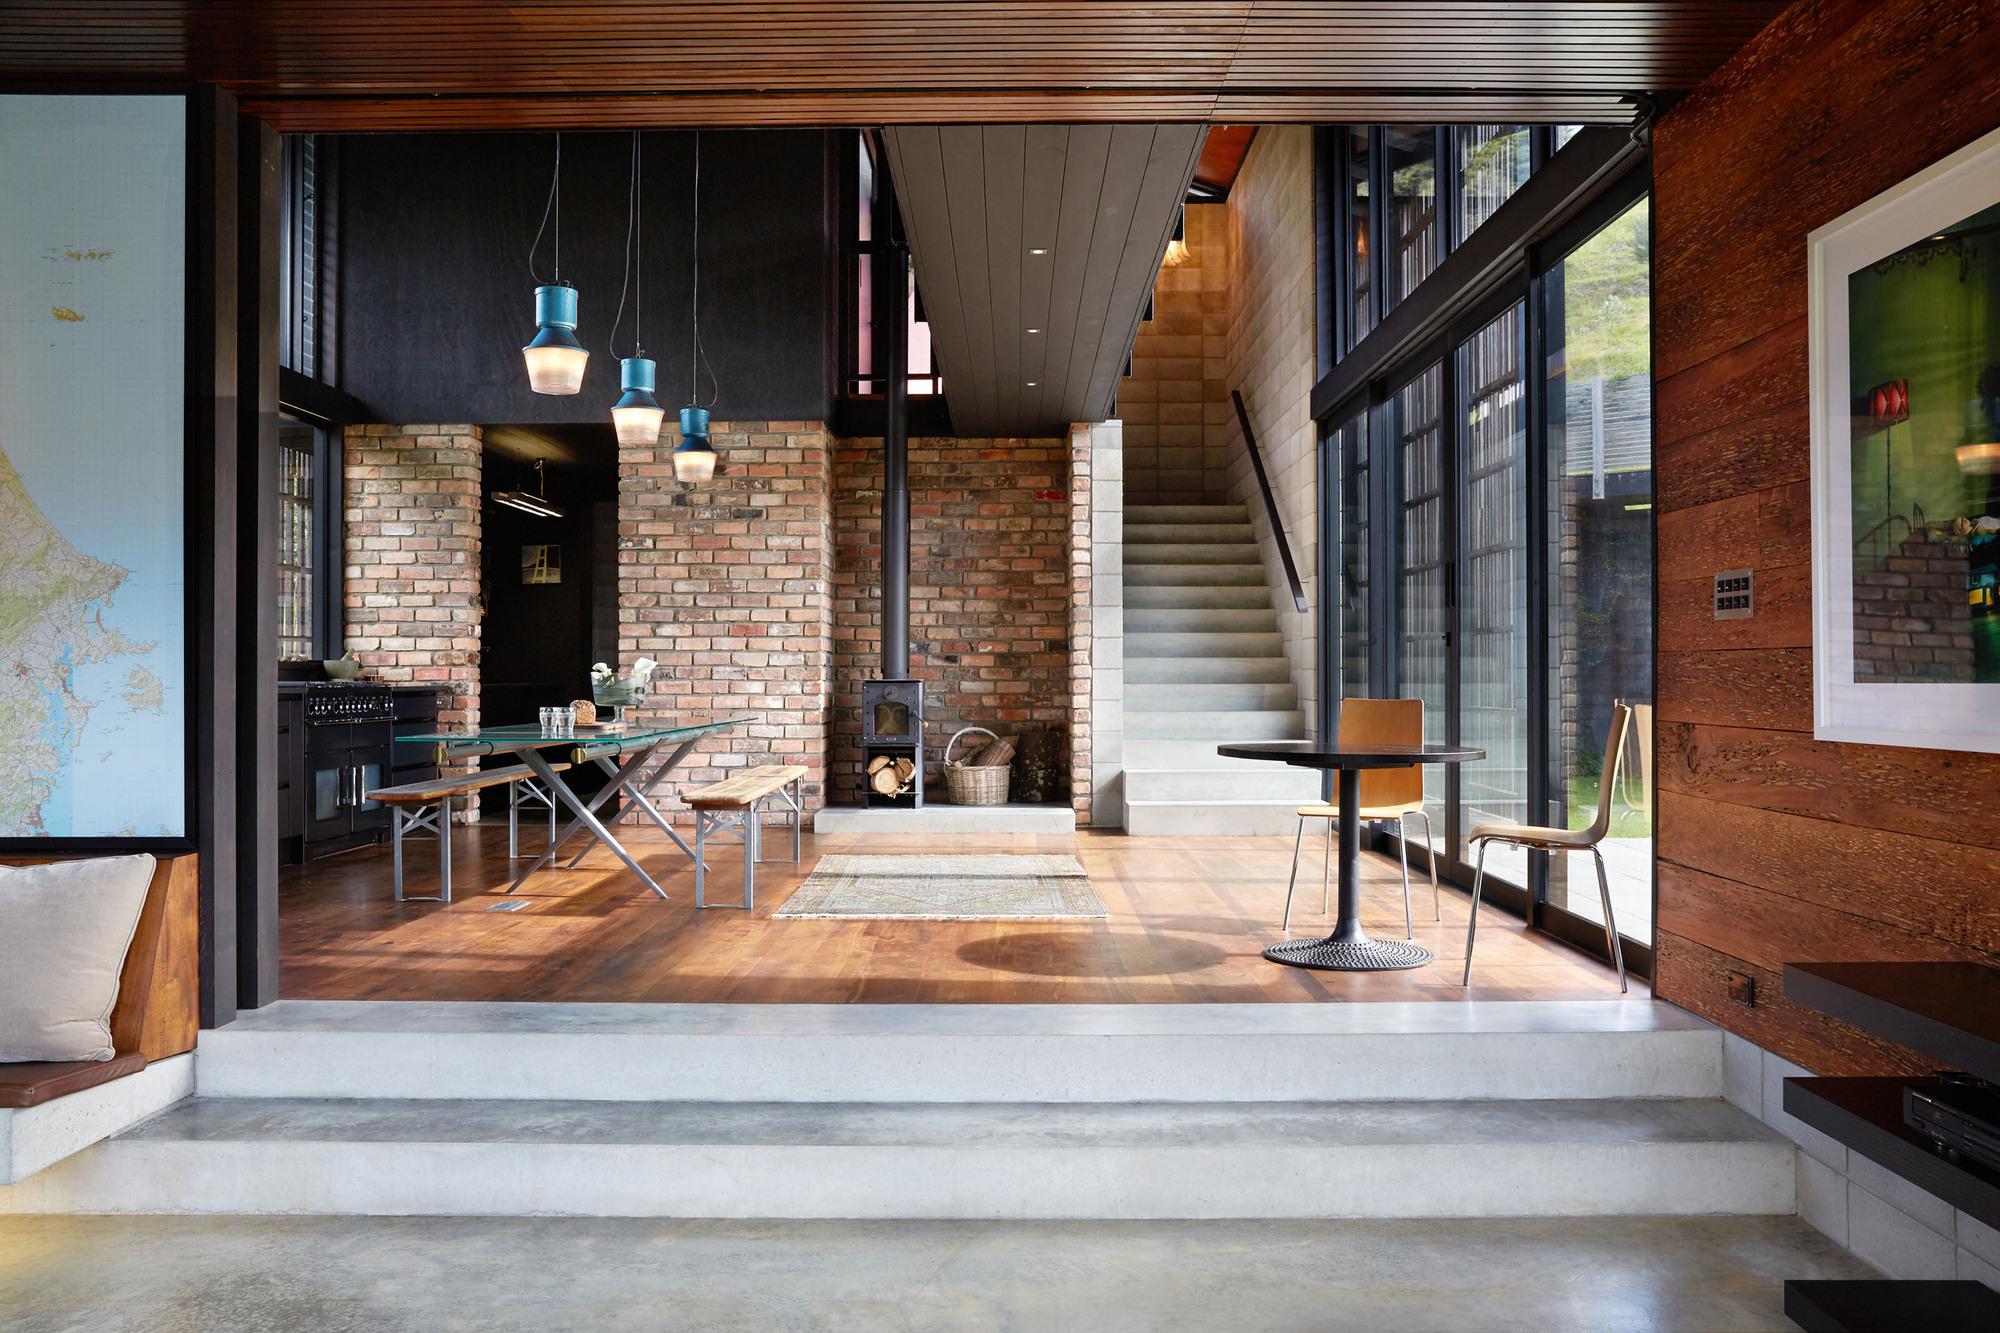 Casa interior  Gerrad Hall Architects  Plataforma